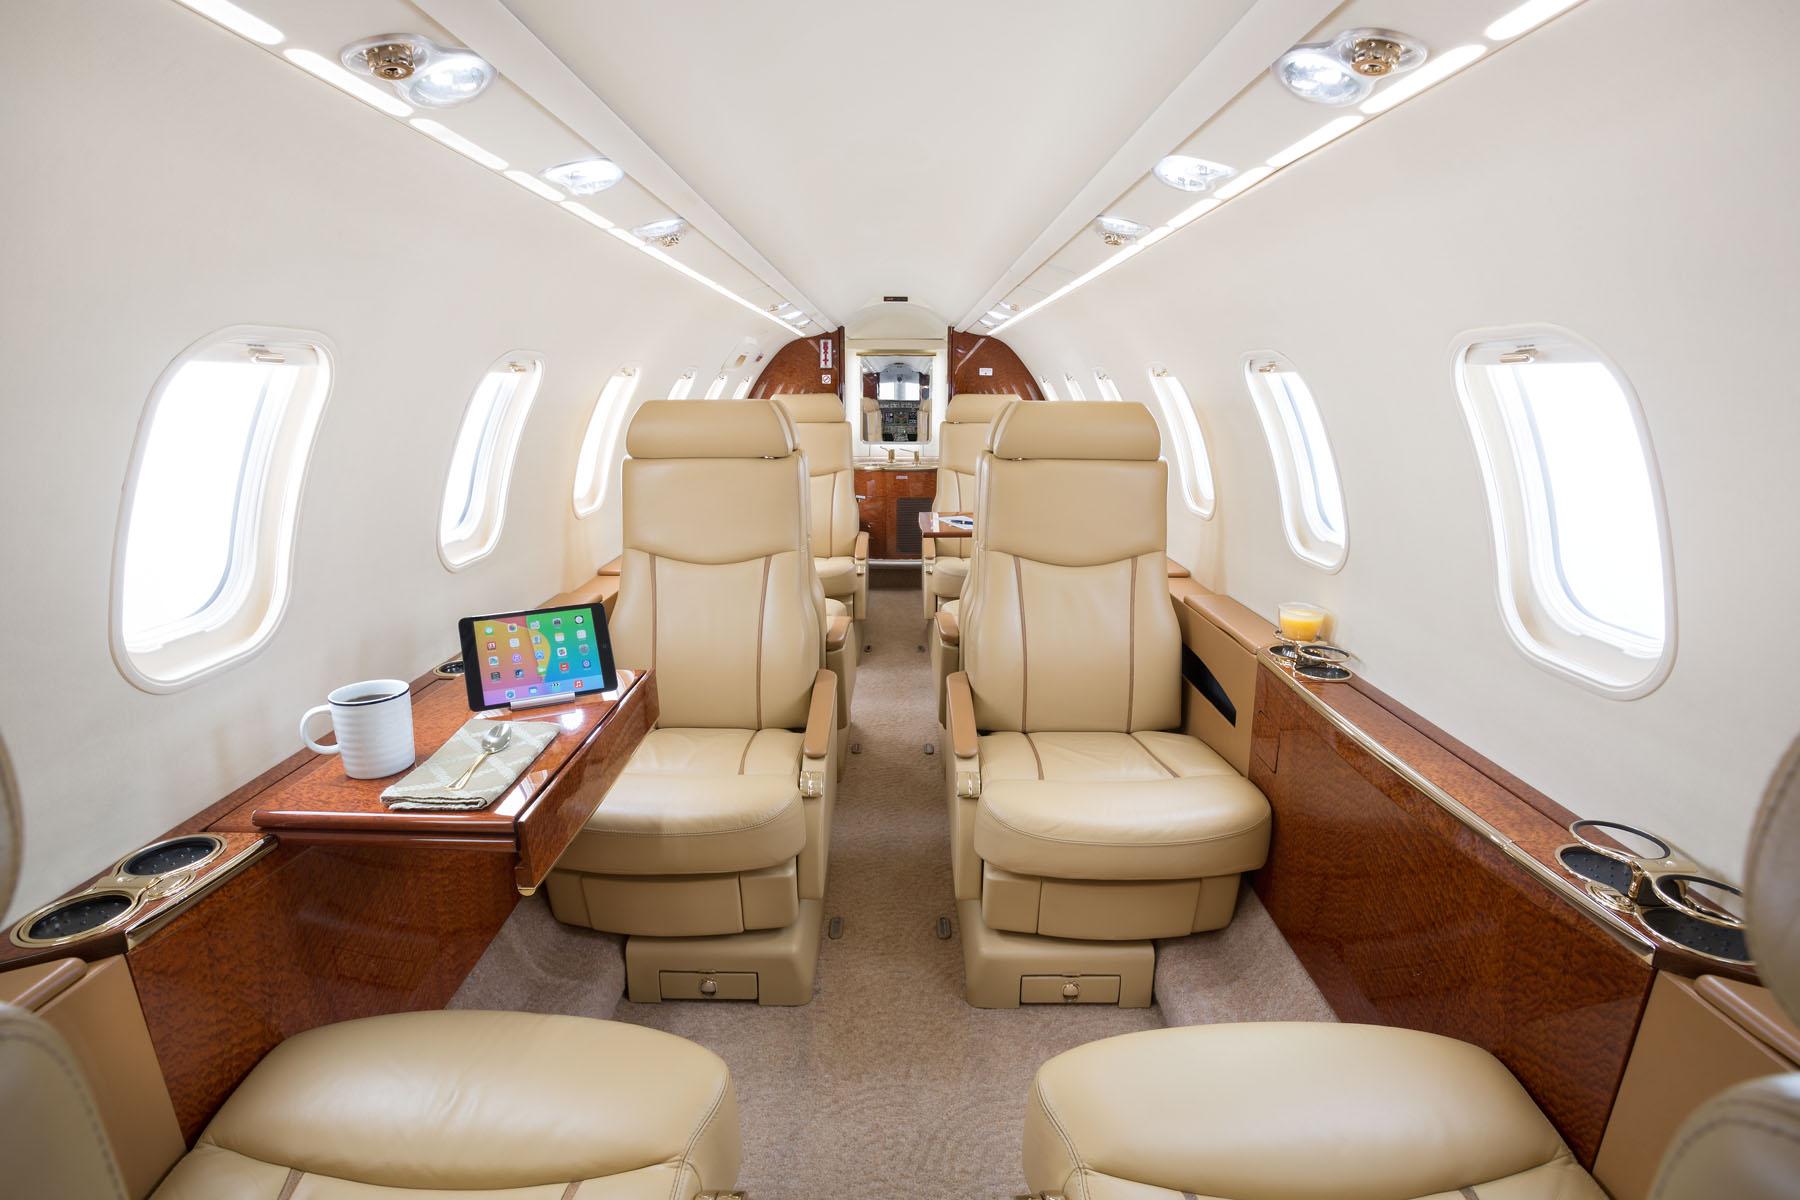 Lear-45_Interior_Light-Jet_Legacy_Aviation_Private_Jet_NetJets_Jet_Charter_TEB_VNY_MIA_PBI_FRG_SFO_FLL_FXE_BED.jpg.jpg